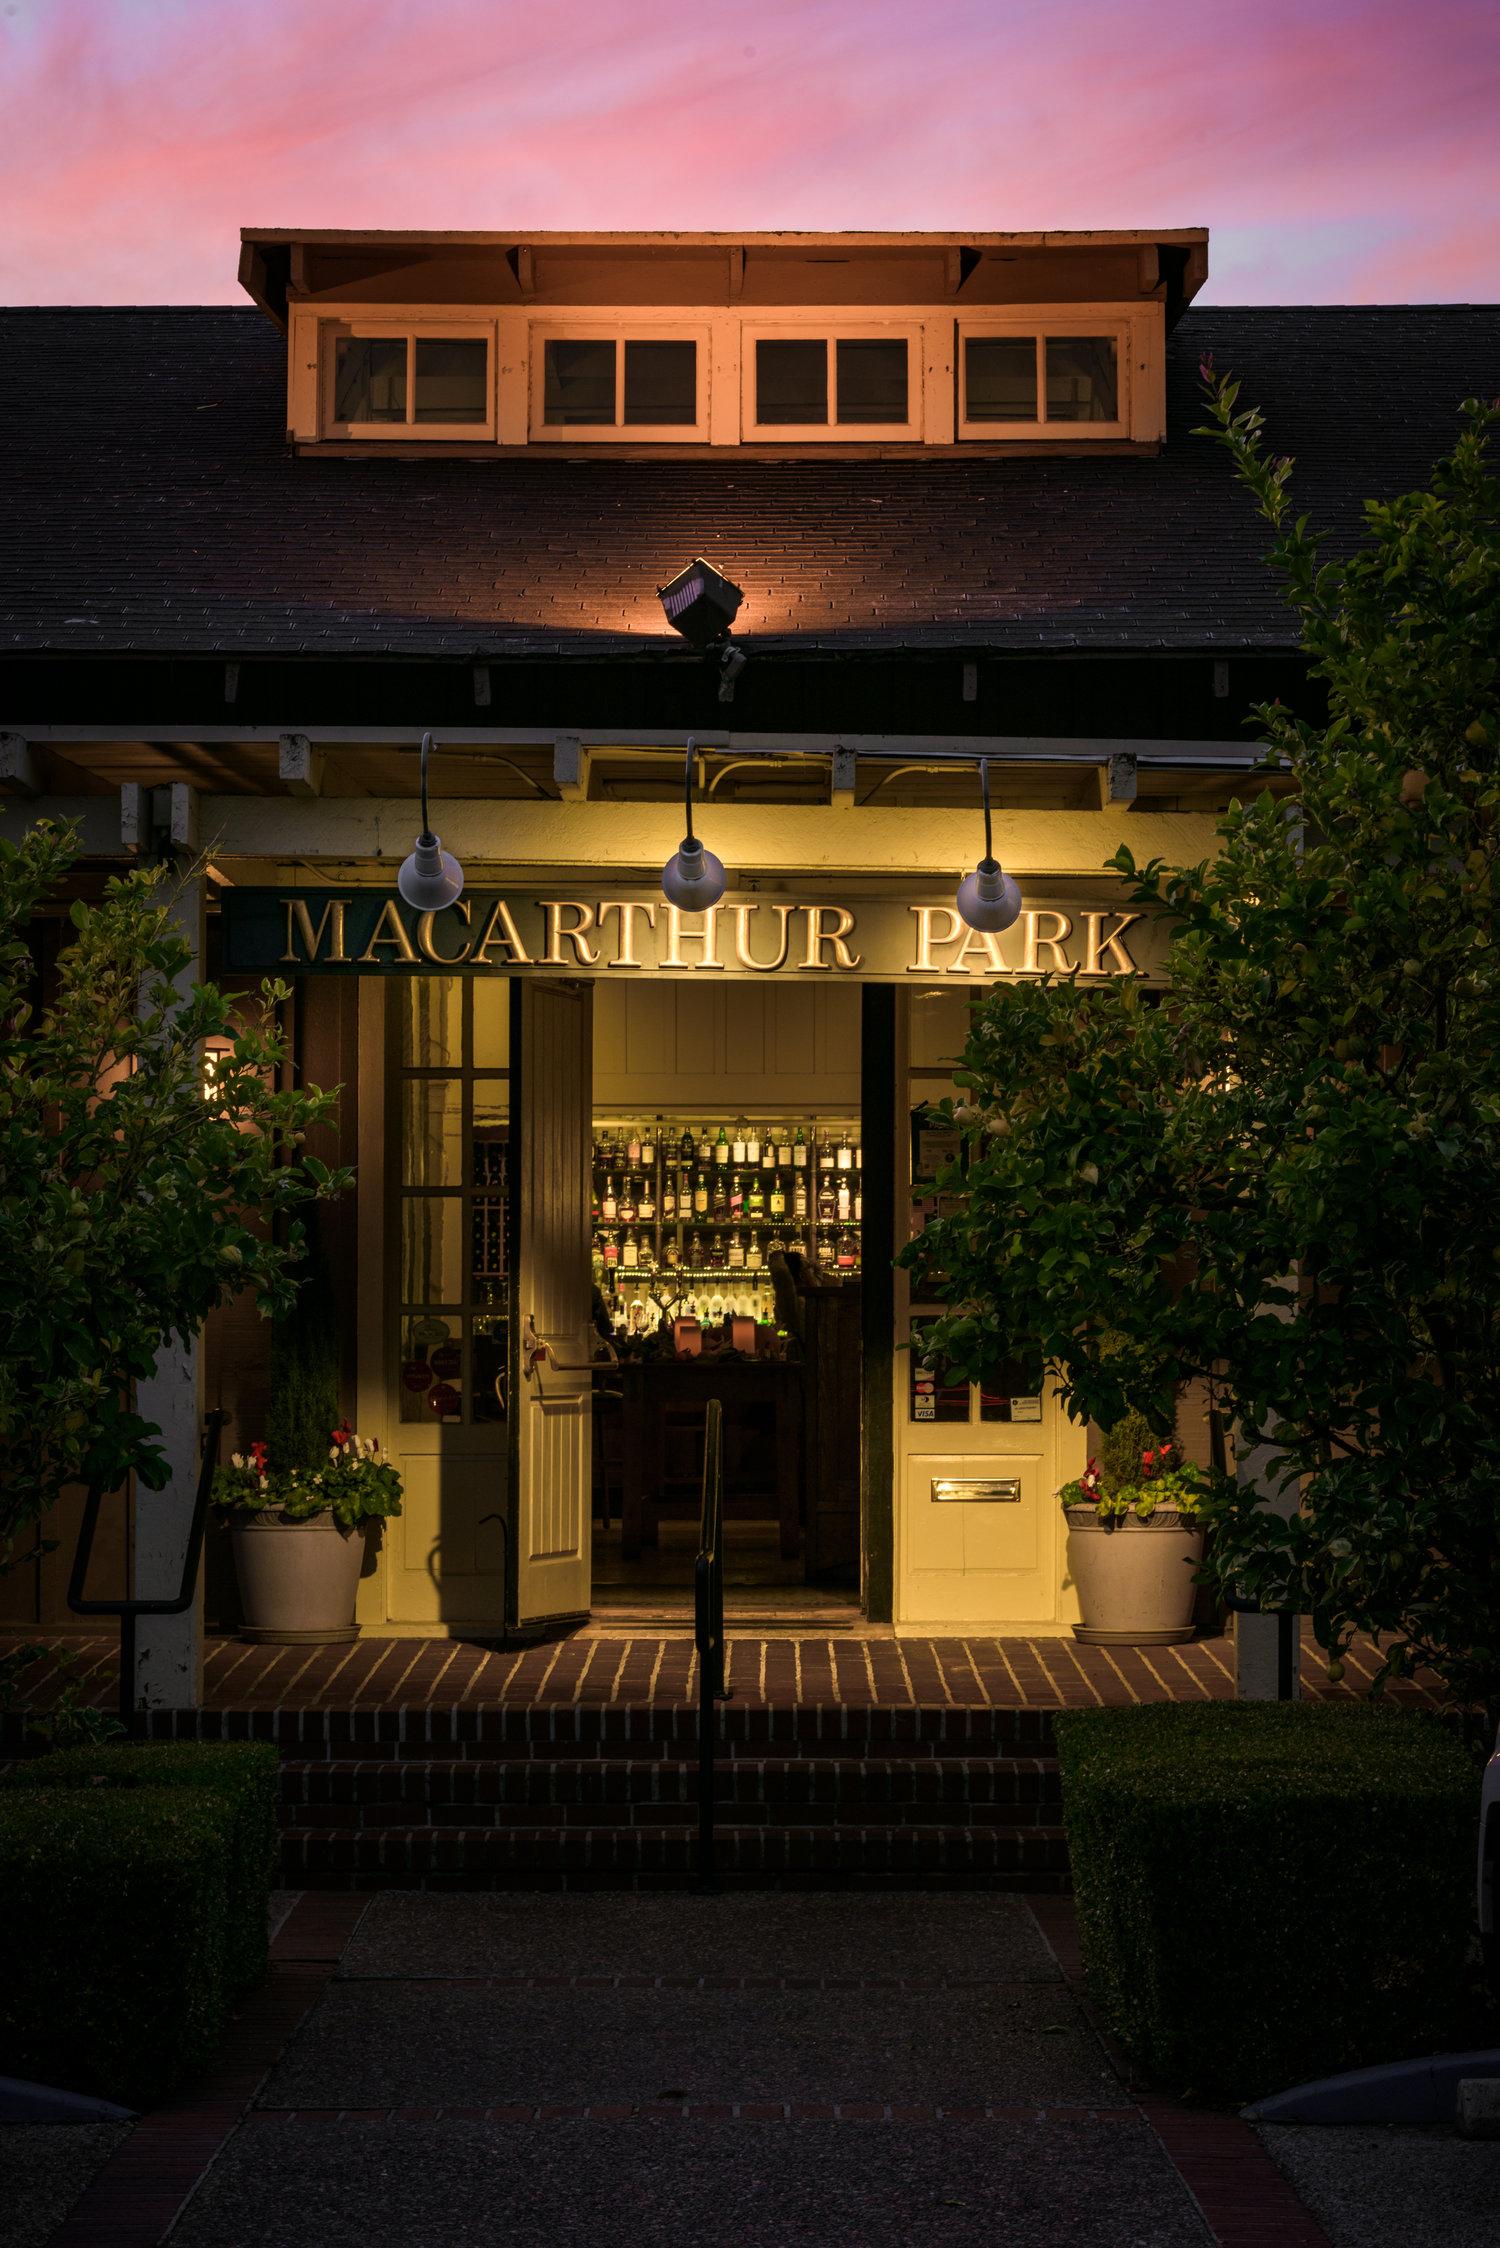 Restaurant exterior architecture - Palo Alto Restaurant Architecture Photography